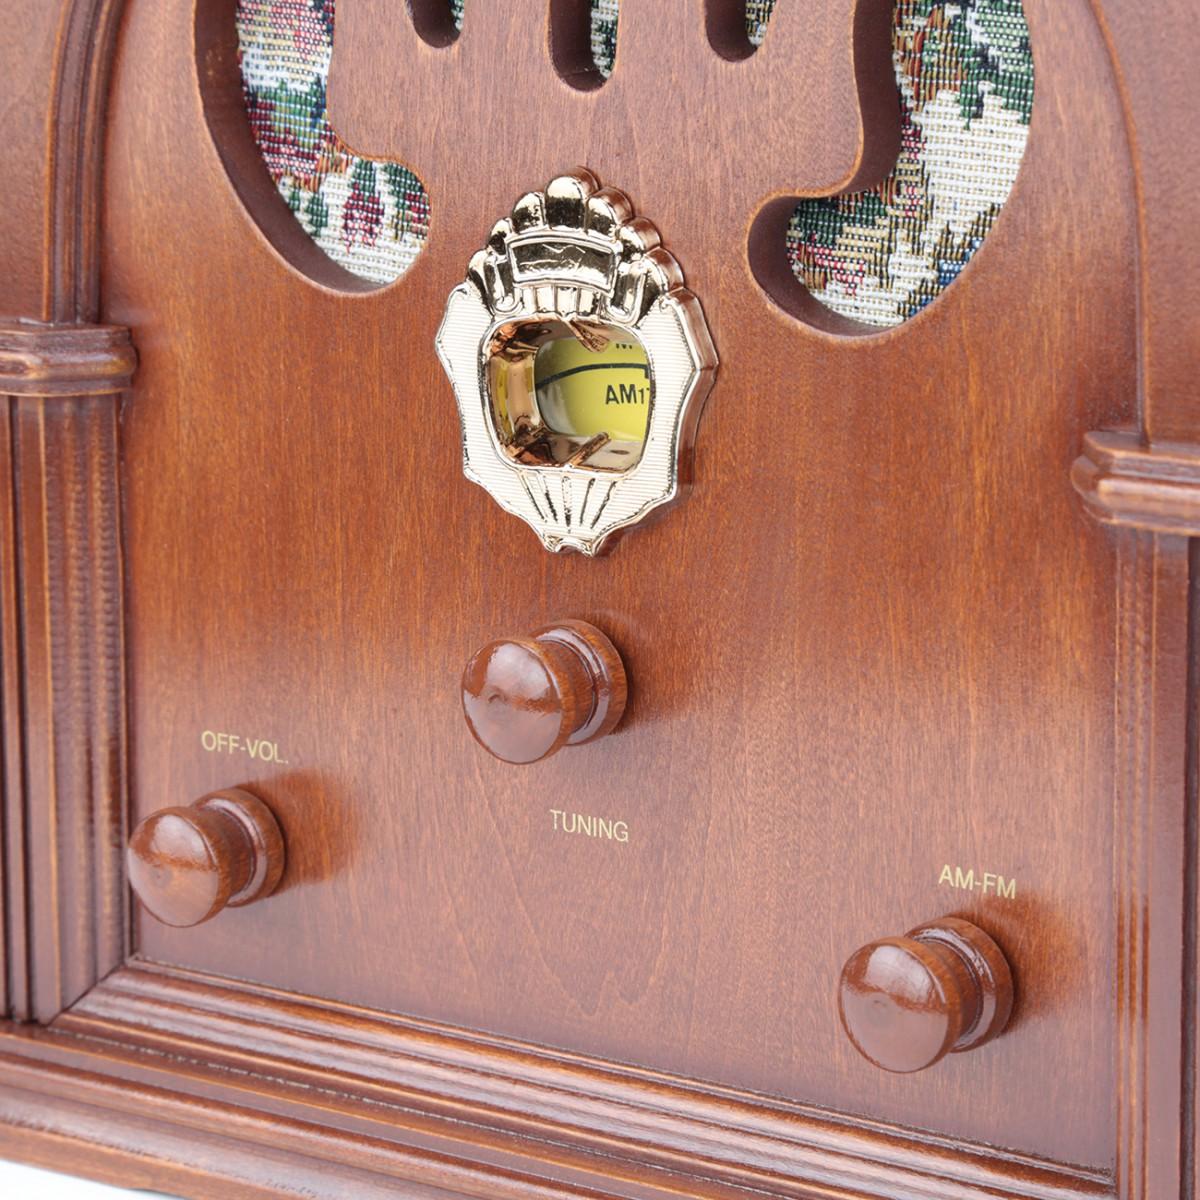 Radios Natural Oak Church Battery Operated 12.5H Cathedral Radio Old Fashioned Radio Cathedral Radios